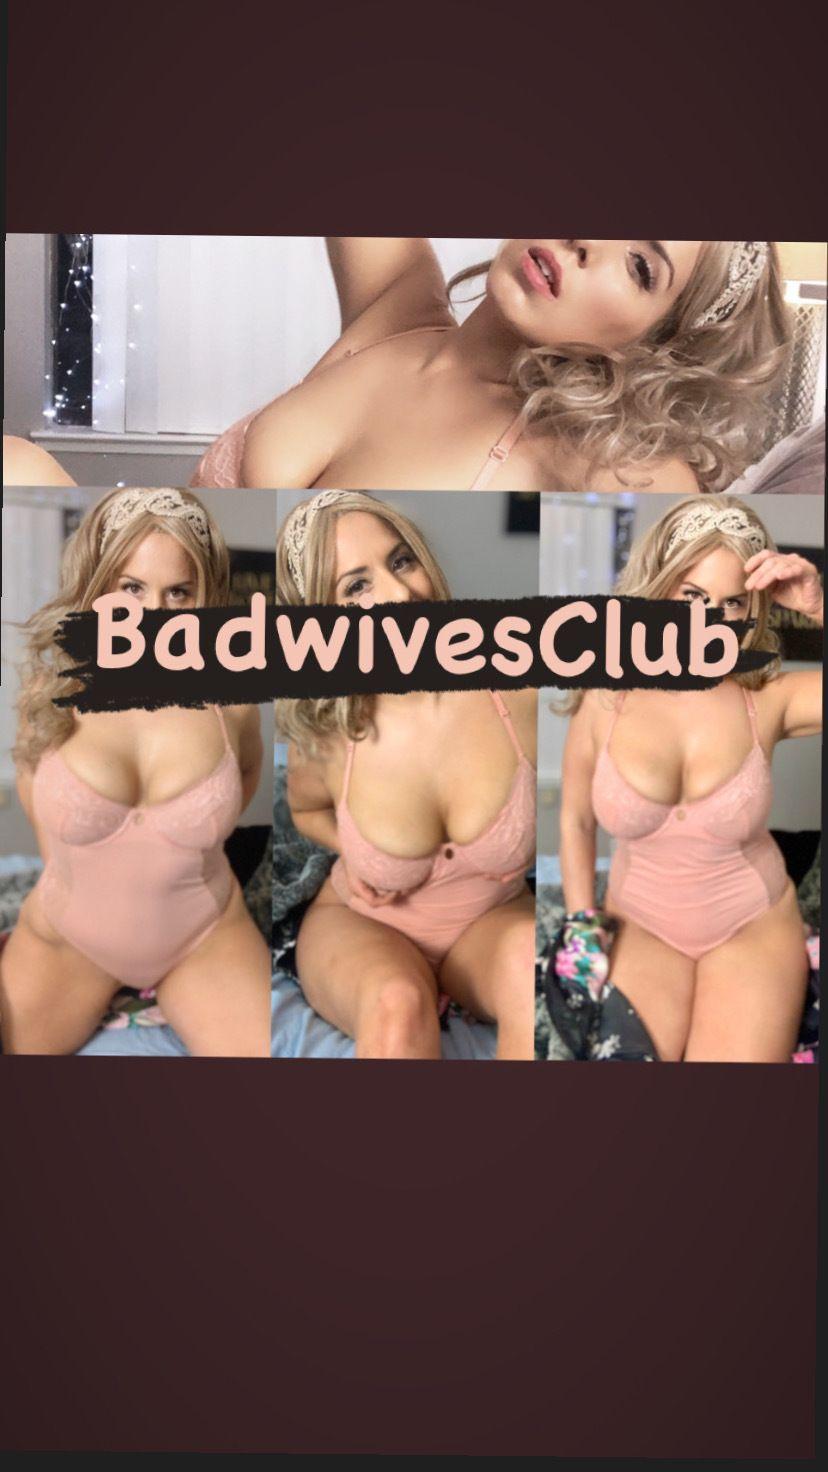 @badwivesclub